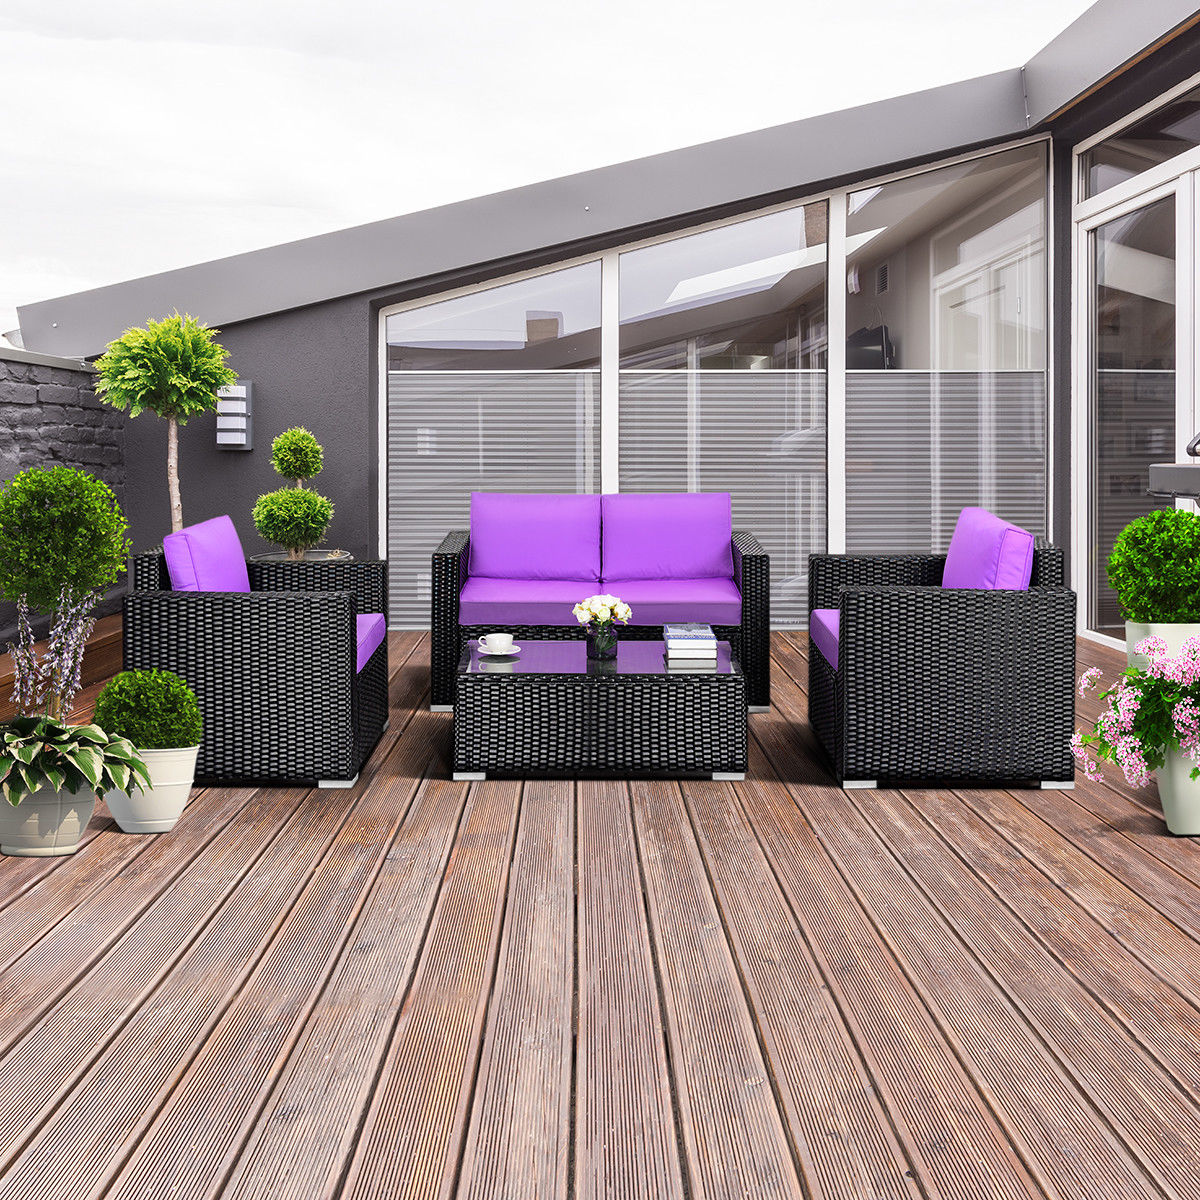 Gymax 4PC Rattan Patio Furniture Set Outdoor Rattan Wicker ...